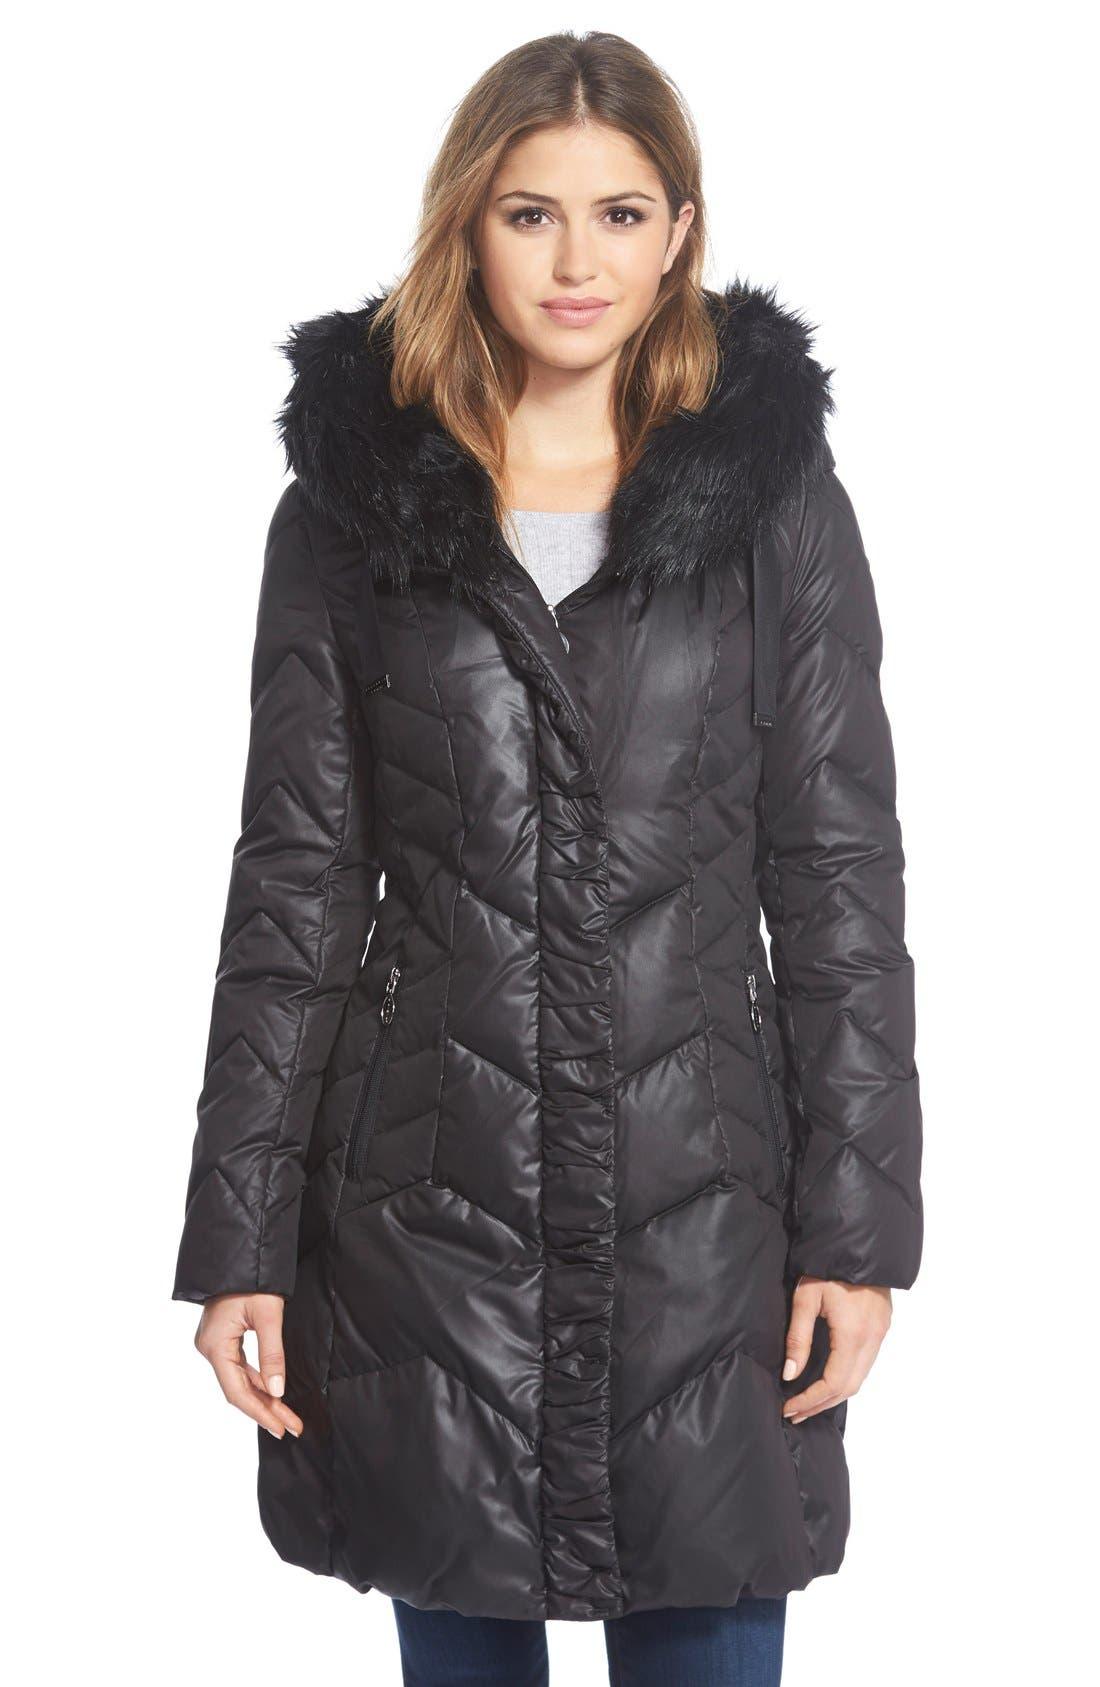 'Mia' FauxFur Trim Hooded Down Coat, Main, color, 001